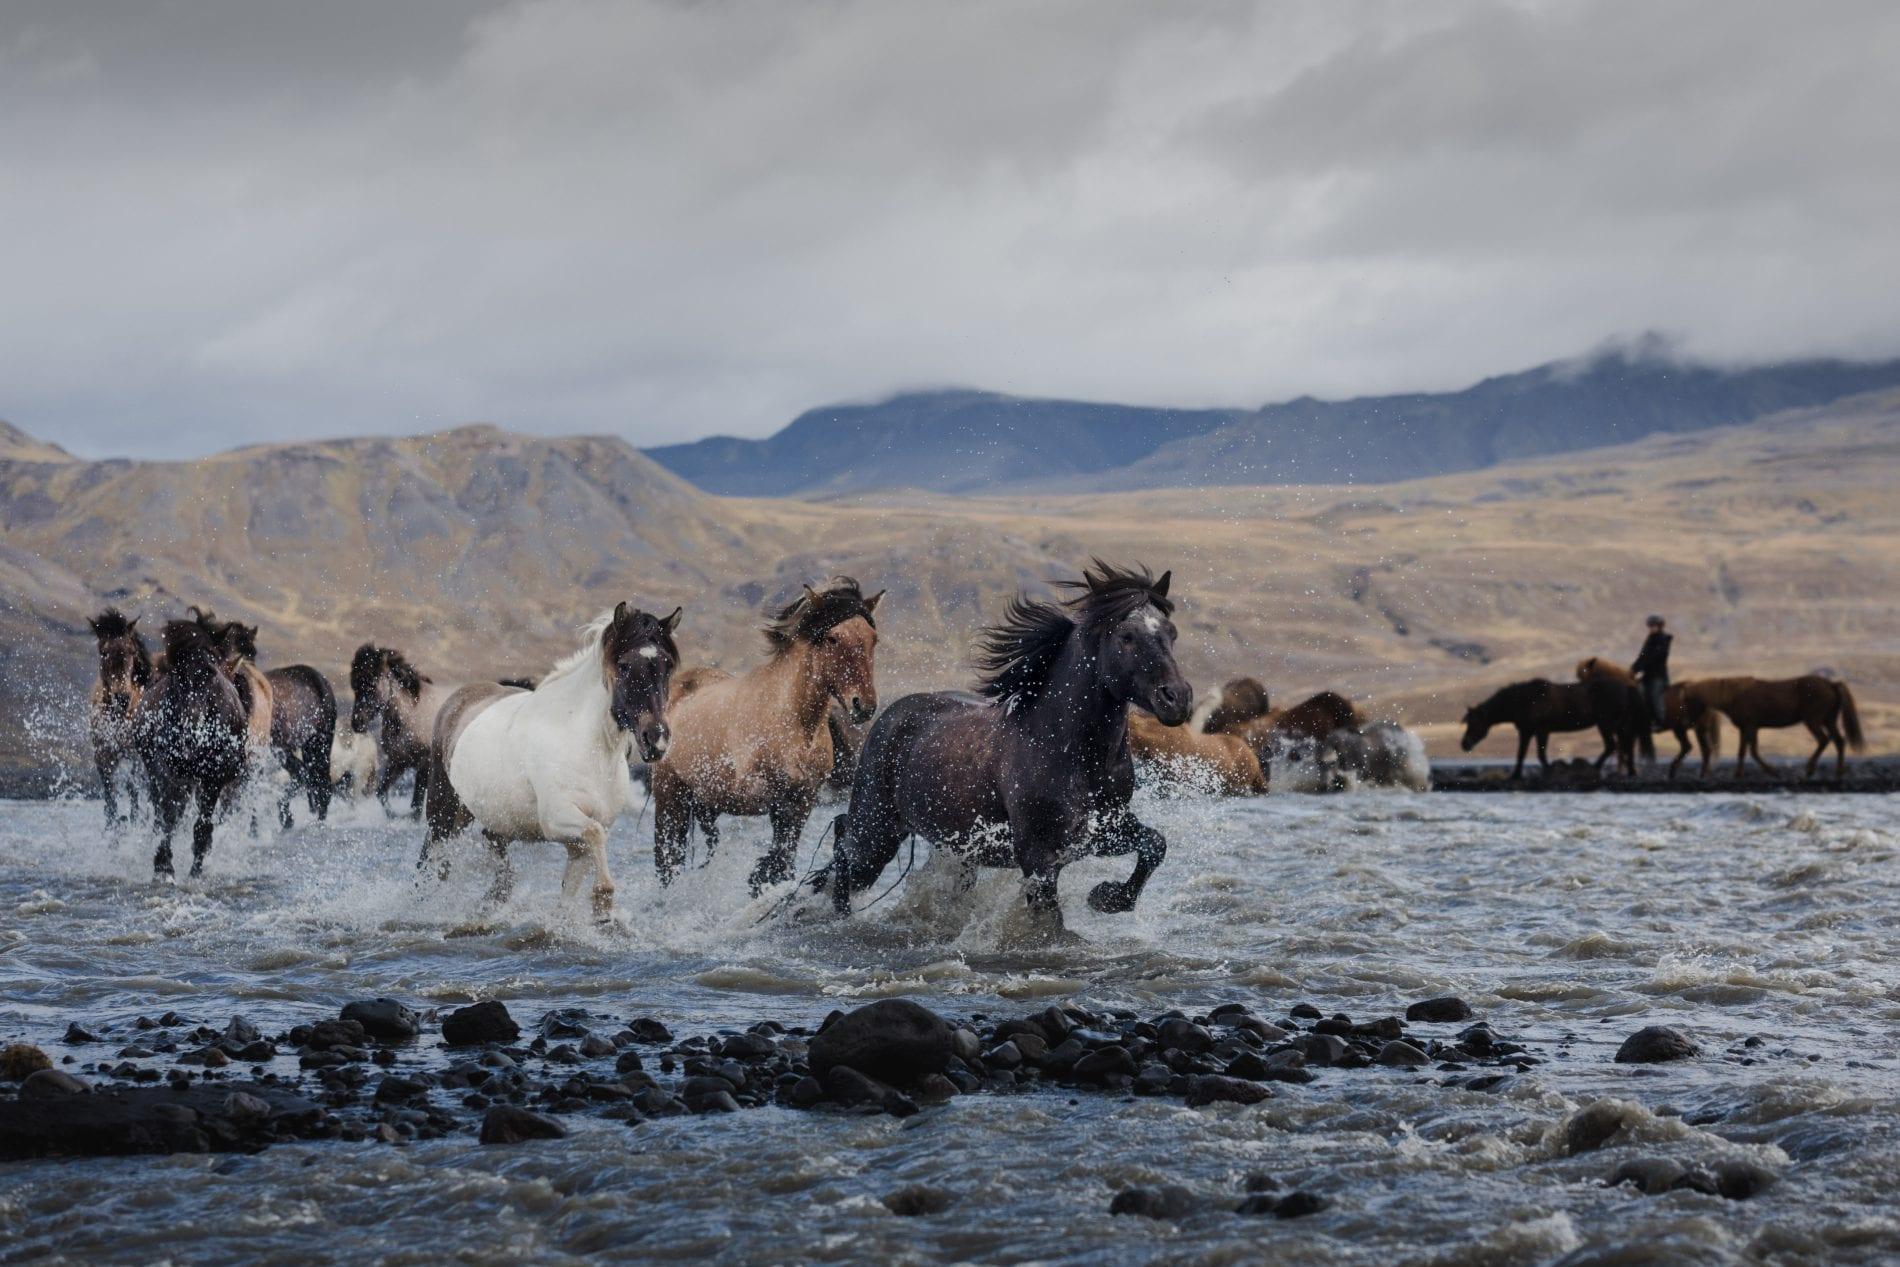 A heard of horses passing a river